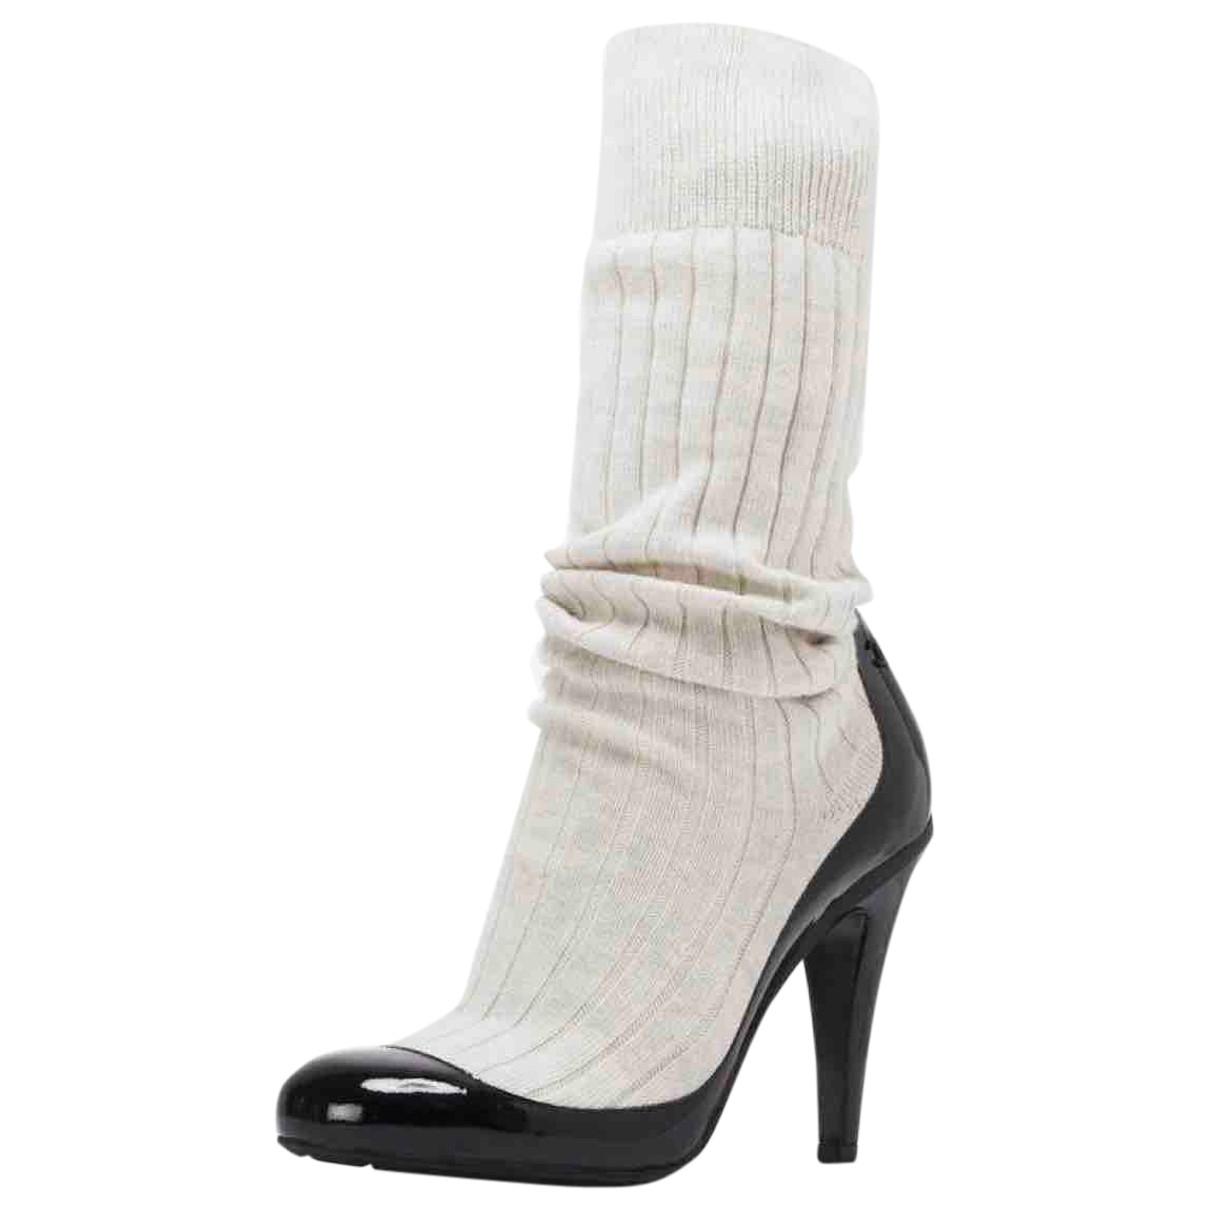 Chanel \N Stiefel in  Weiss Lackleder